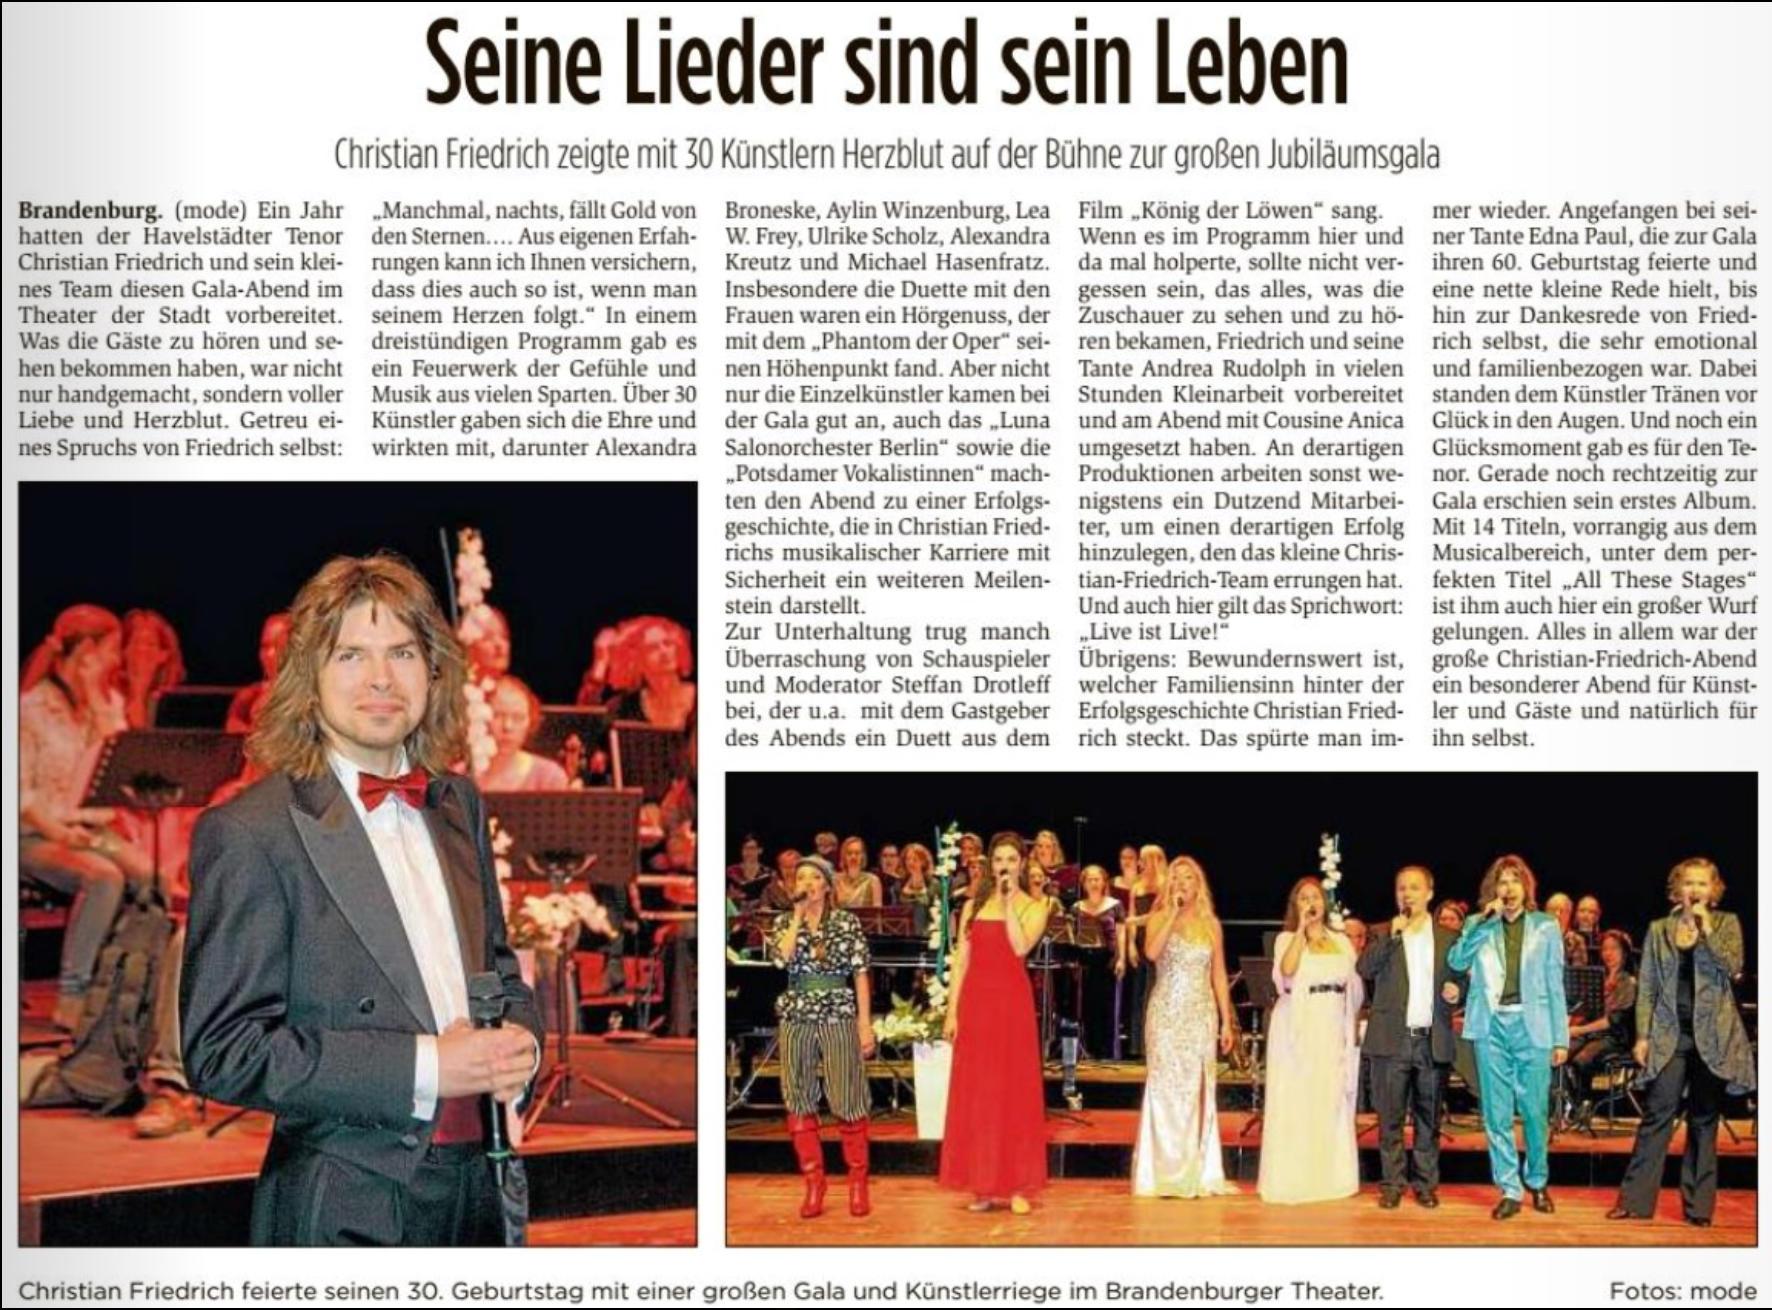 Christian Friedrich Tenor offizielle Seite